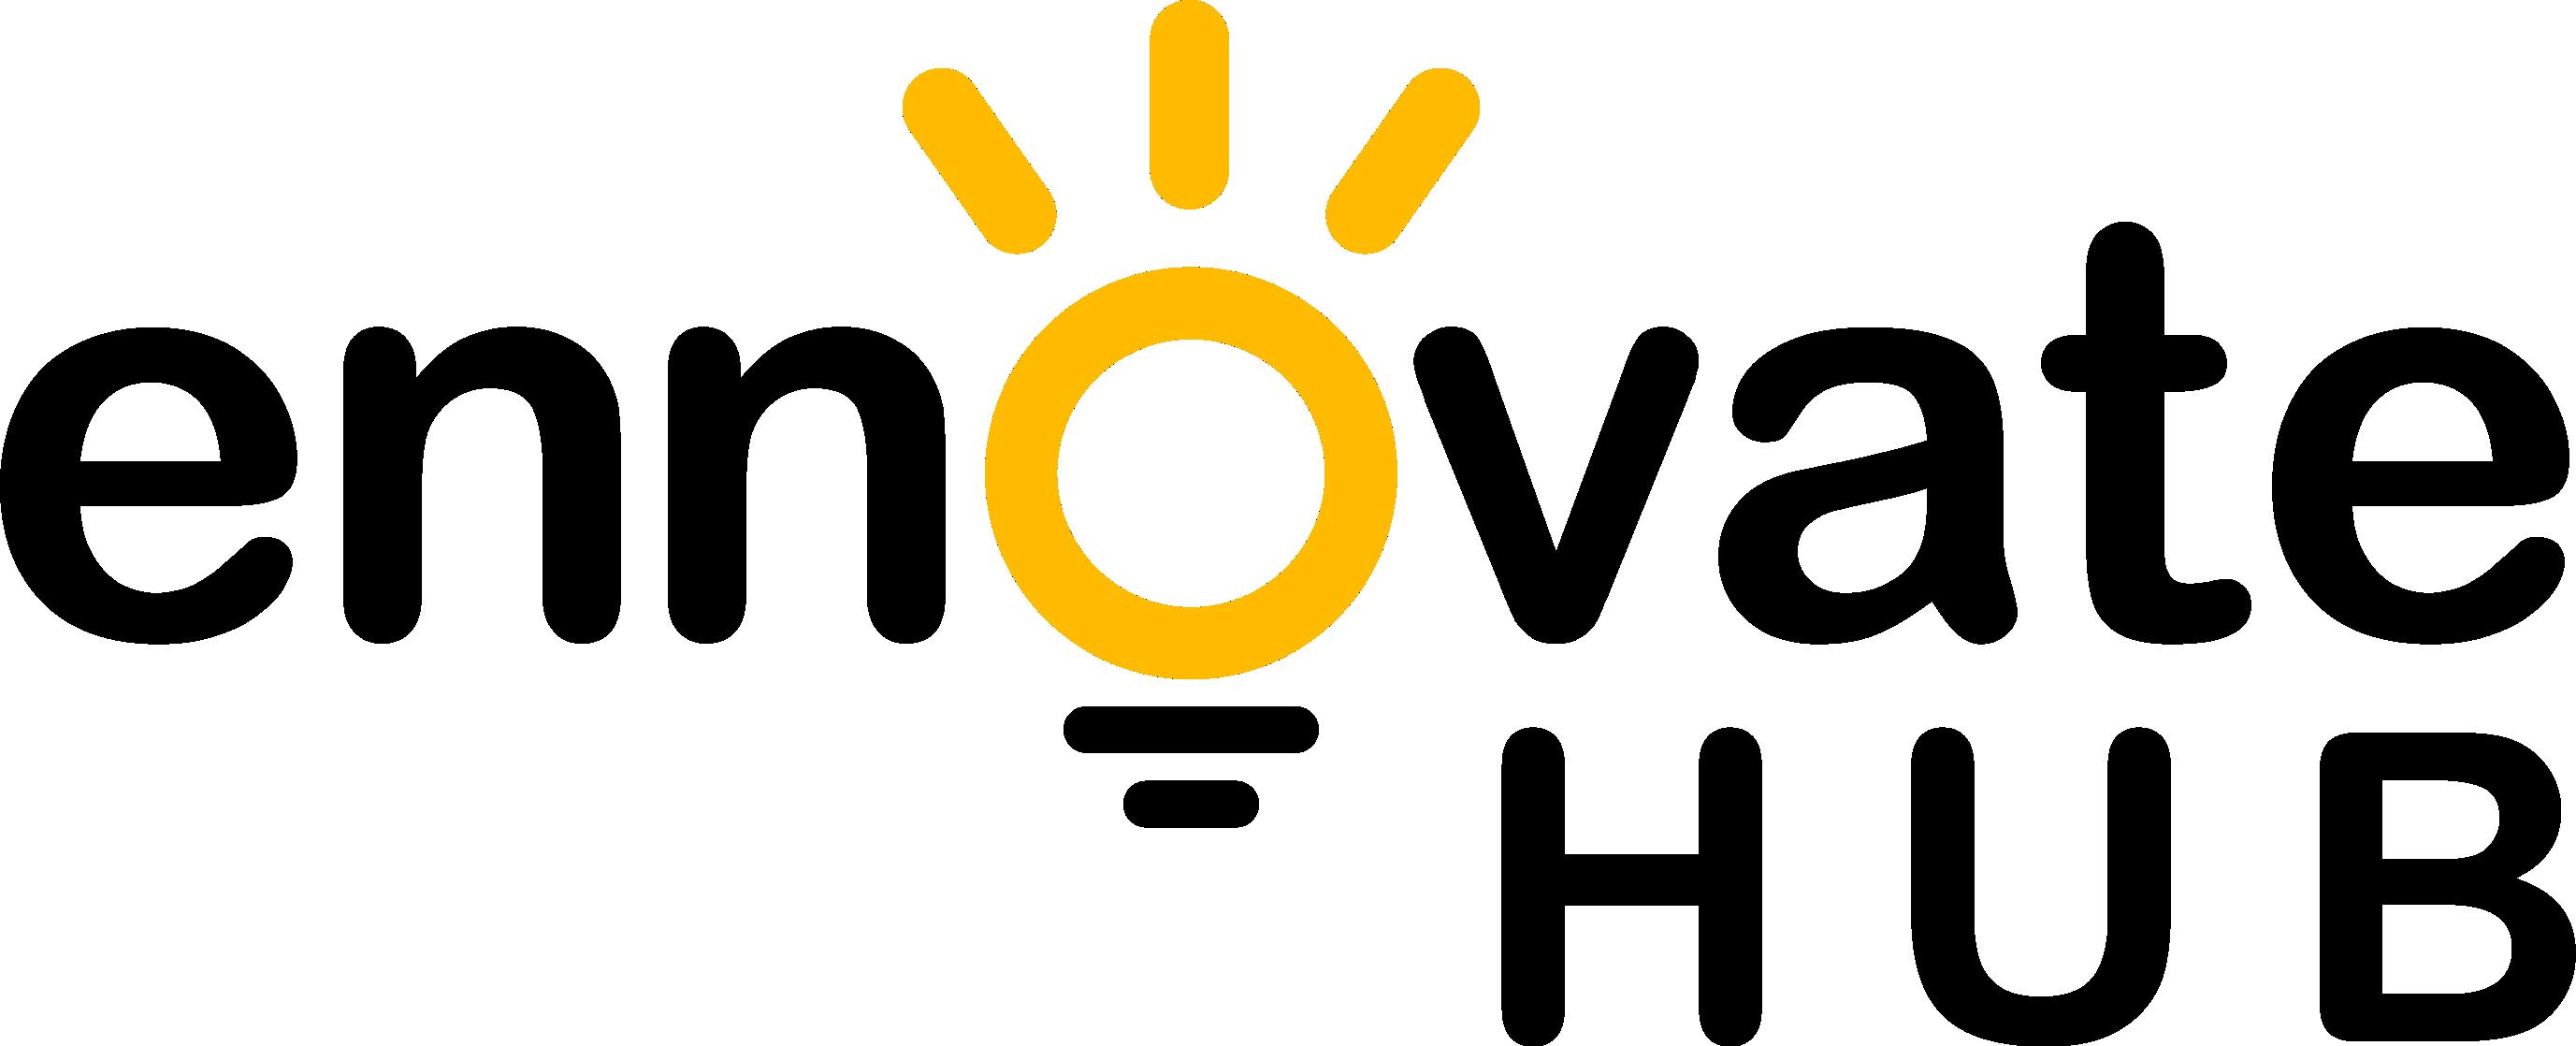 Ennovate Hub